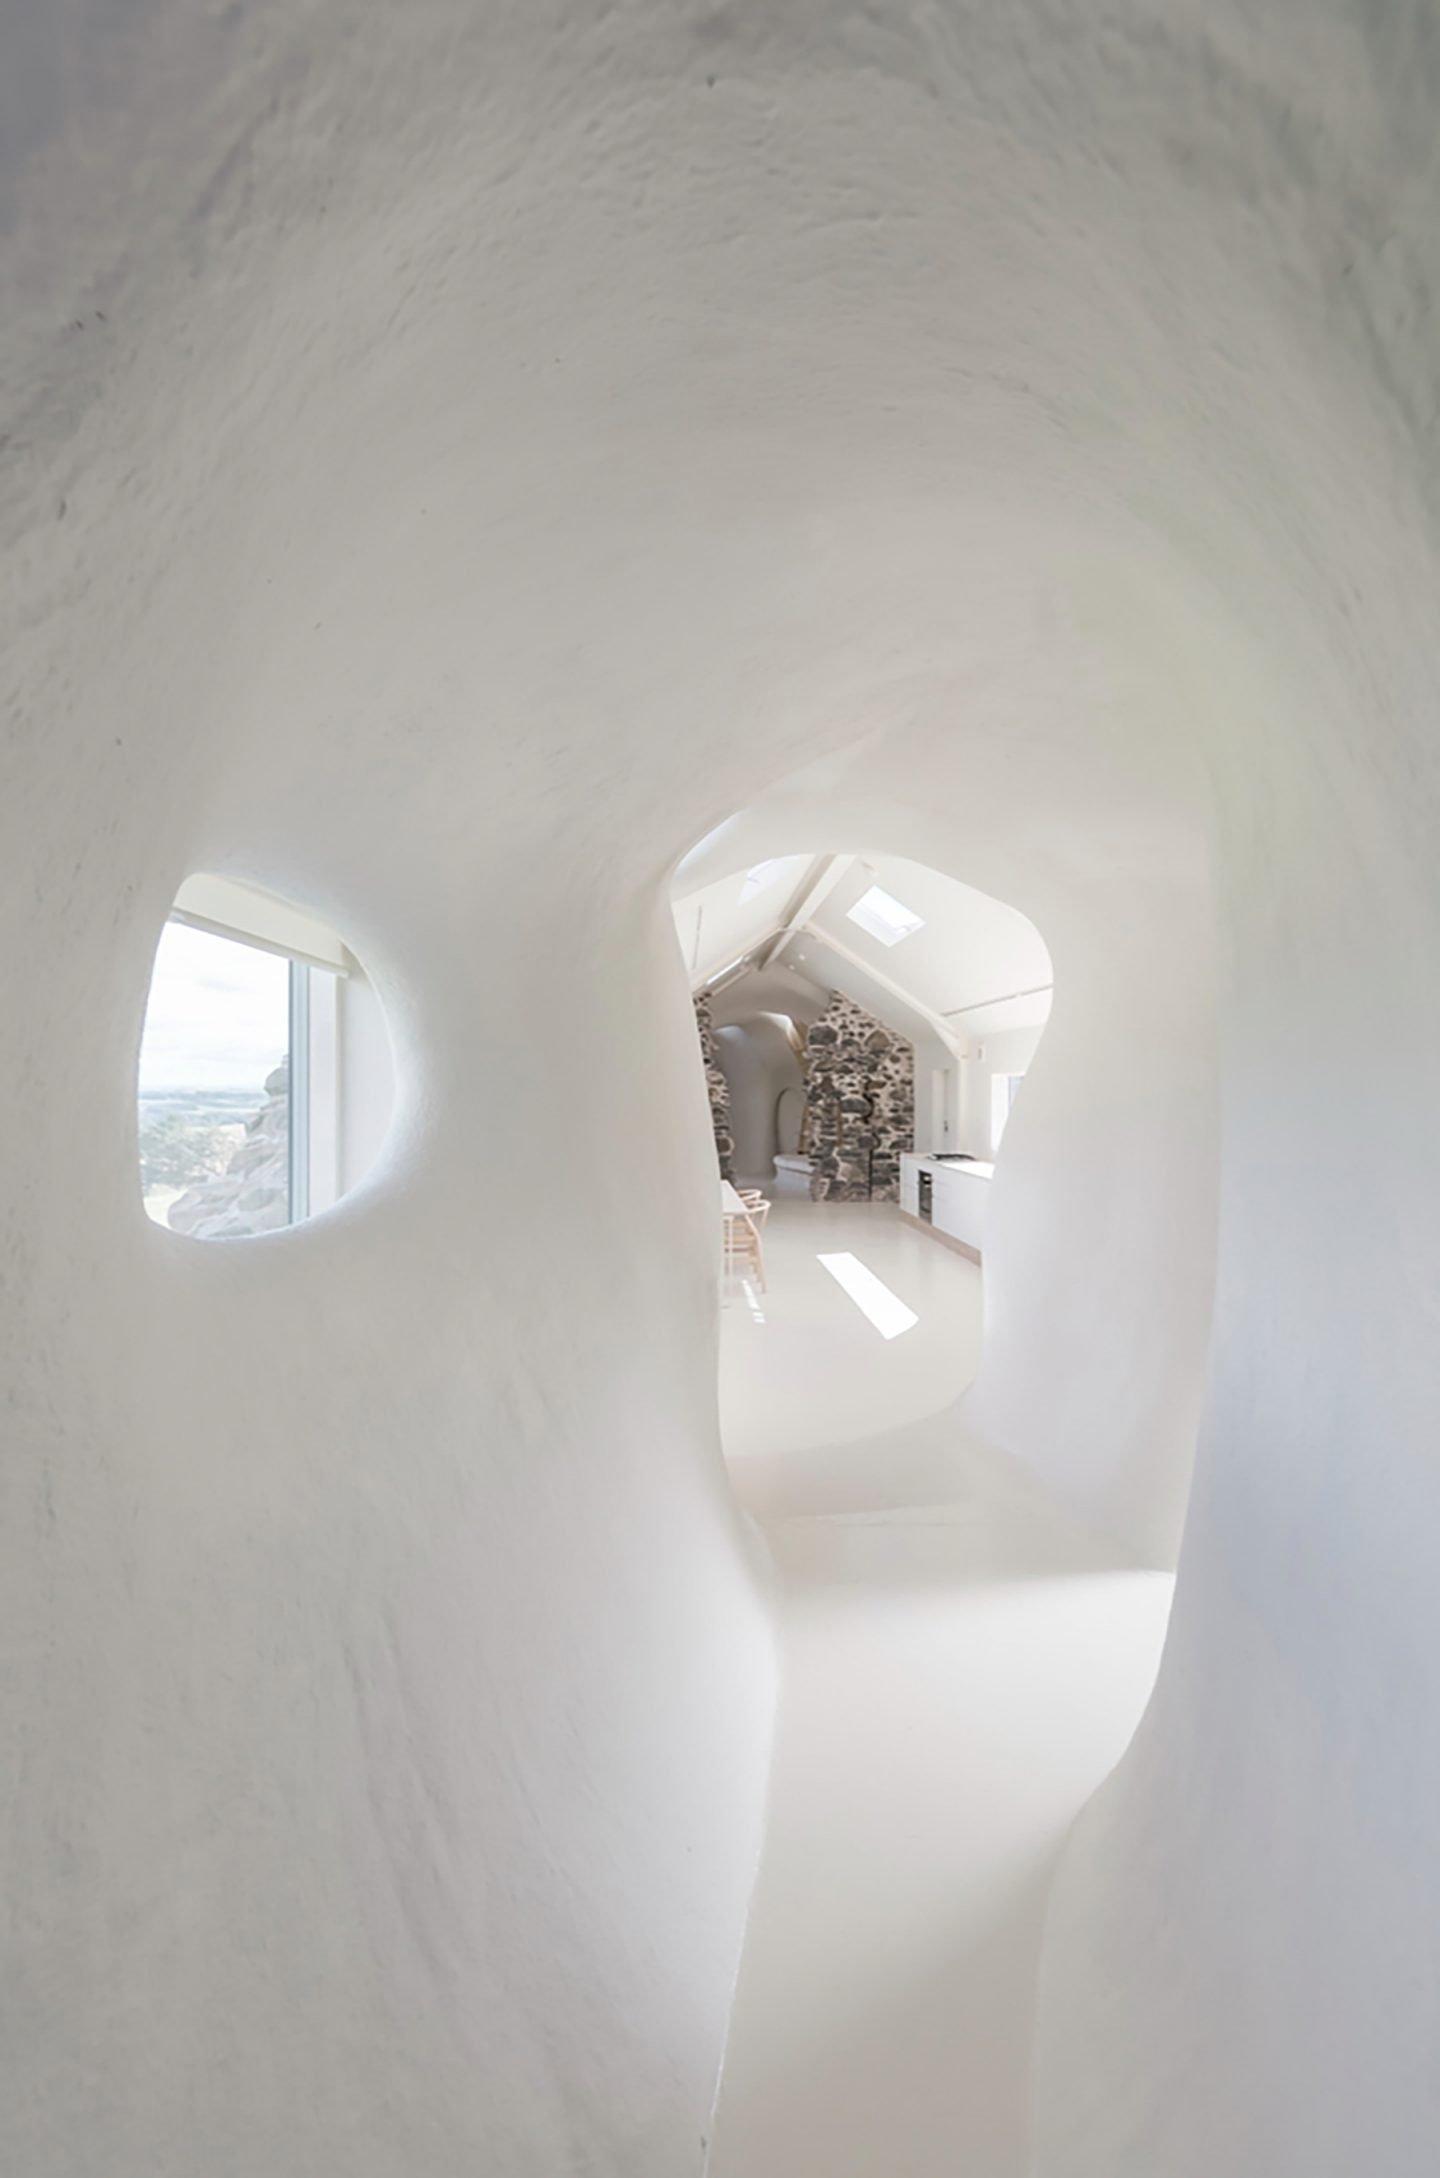 iGNANT-Architecture-Lily-Jencks-Studio-Nathanael-Dorent-Architecture-Ruin-Studio-25